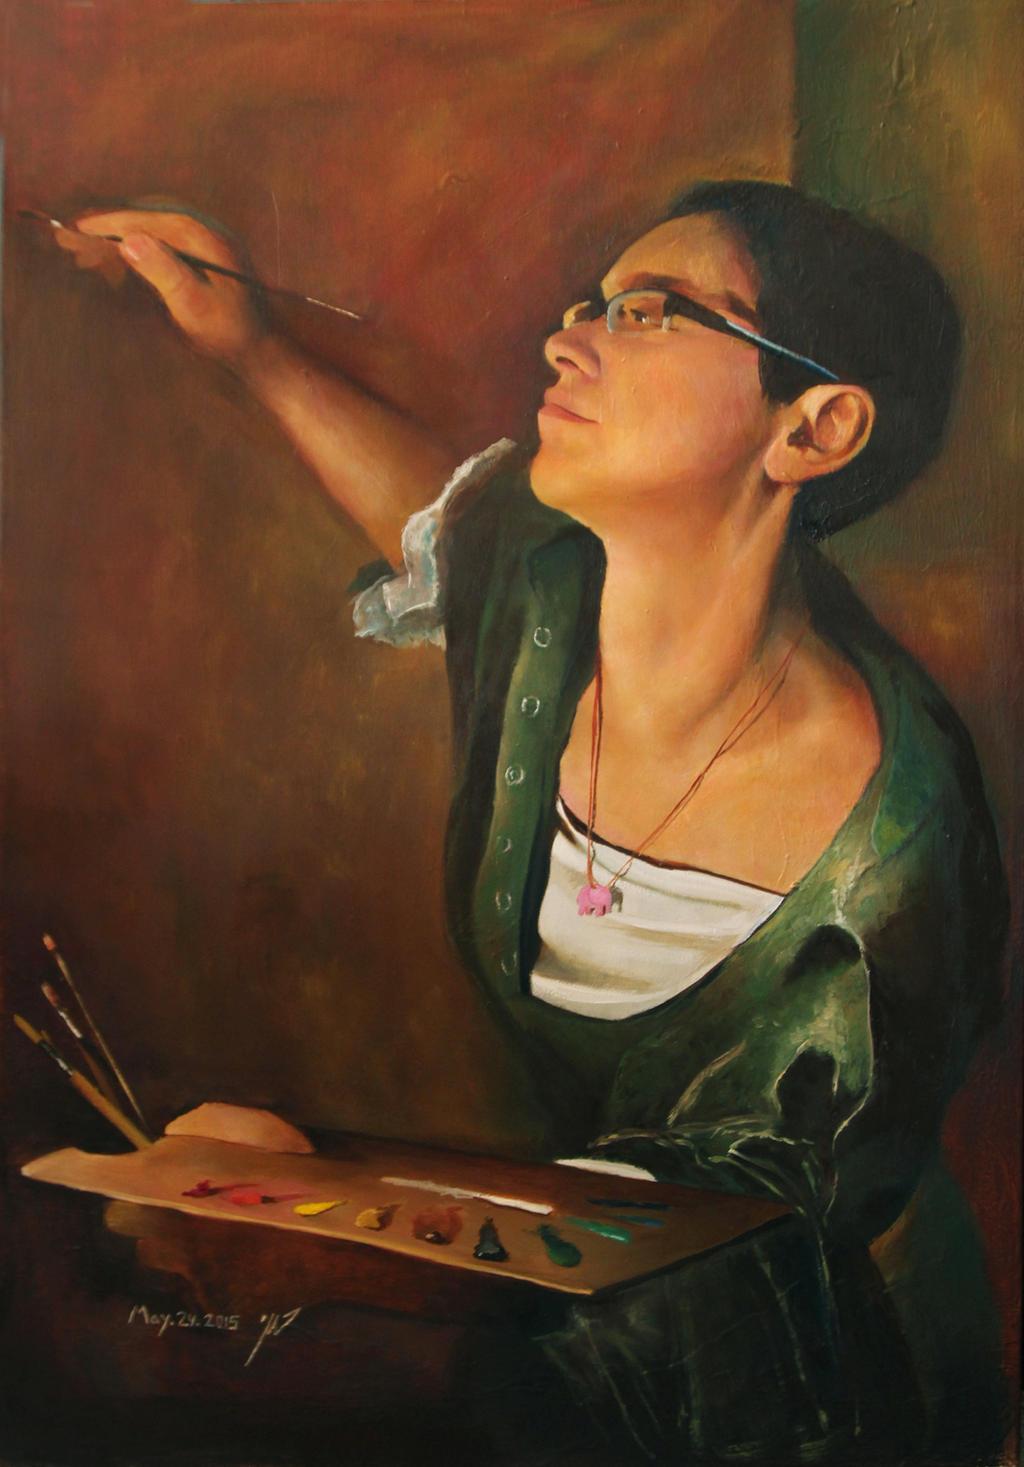 Self portrait as artemisia gentileschi by roni-yoffe on